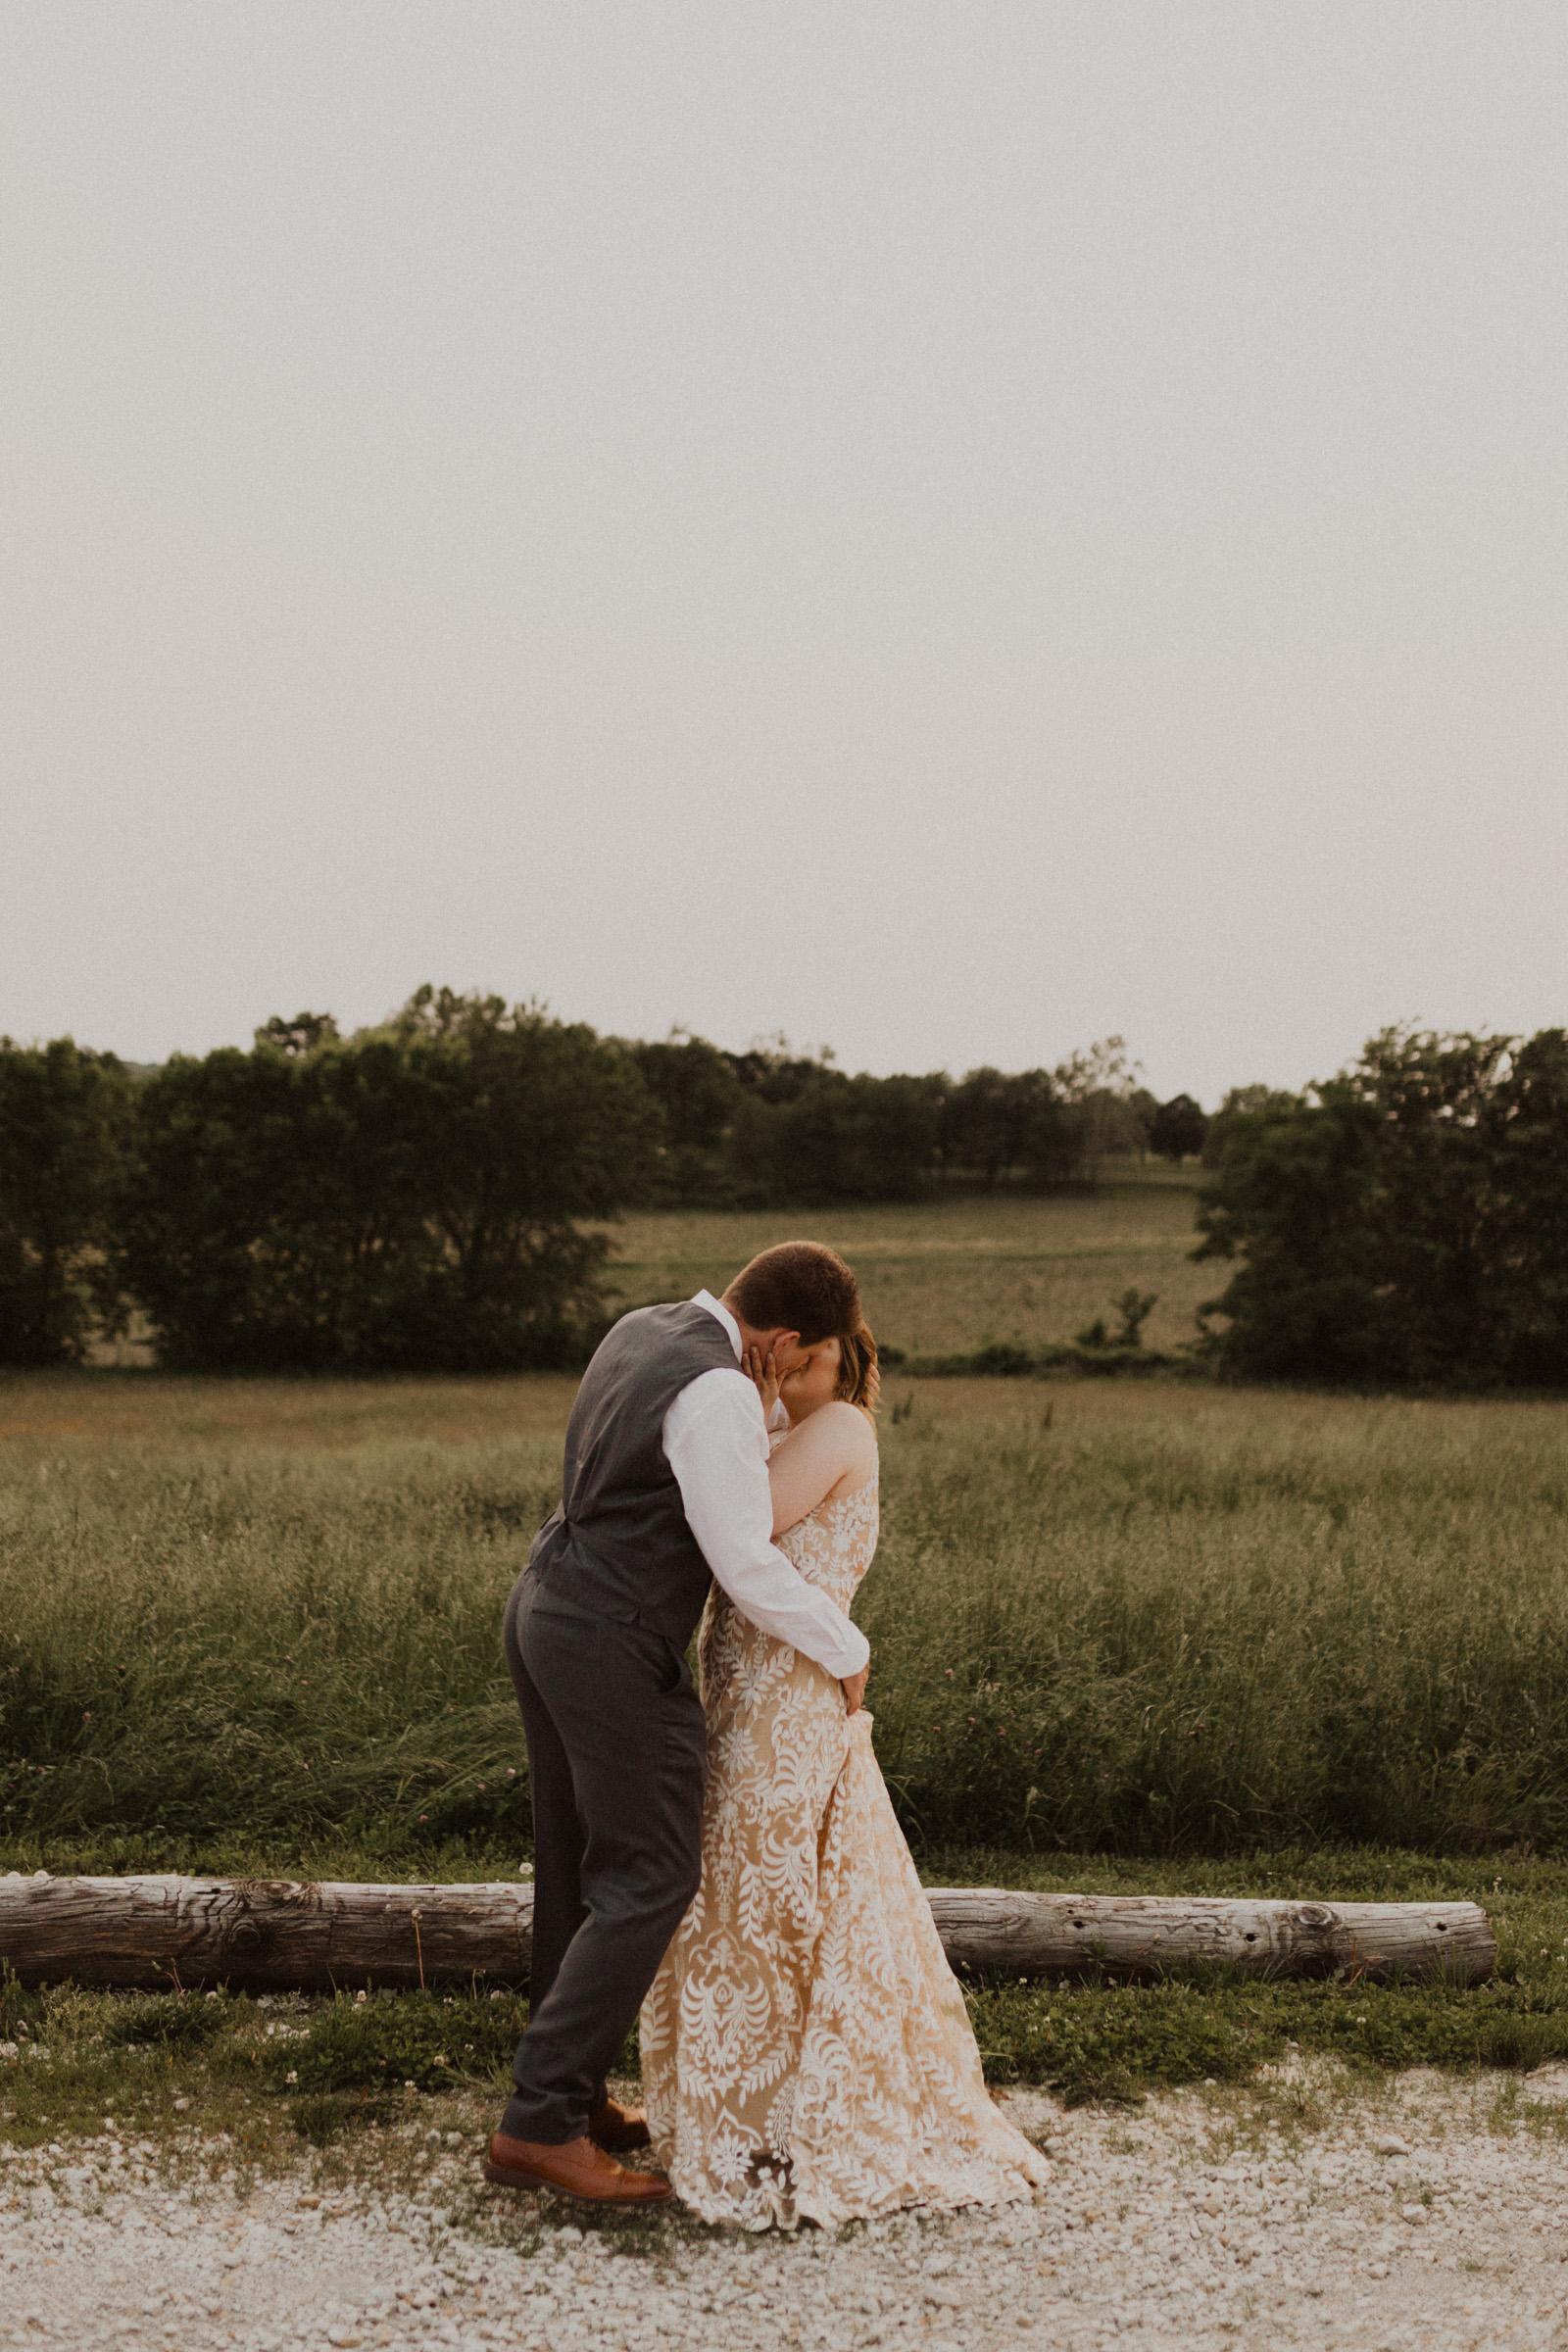 alyssa barletter photography weston red barn farm timberbarn summer outdoor wedding-53.jpg